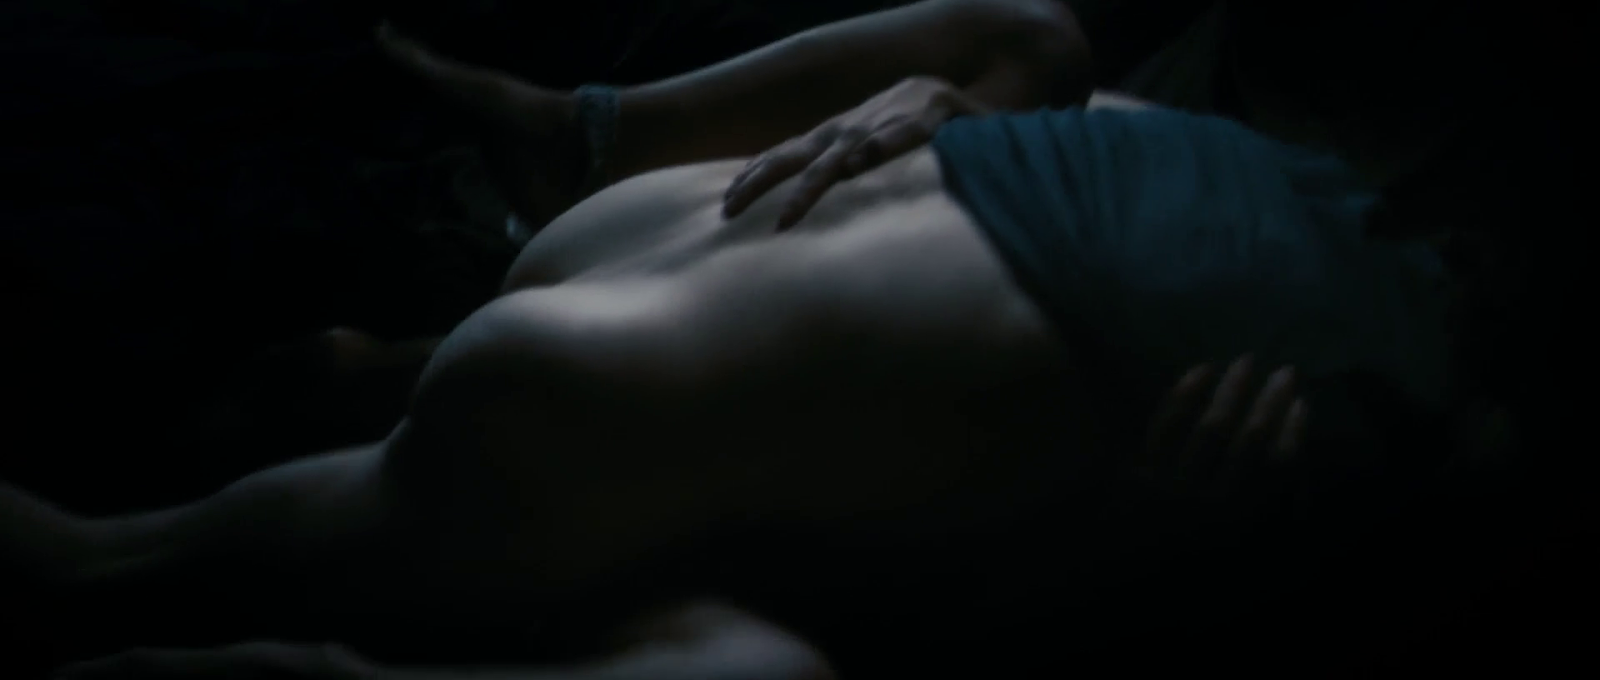 antichrist-movie-sex-scene